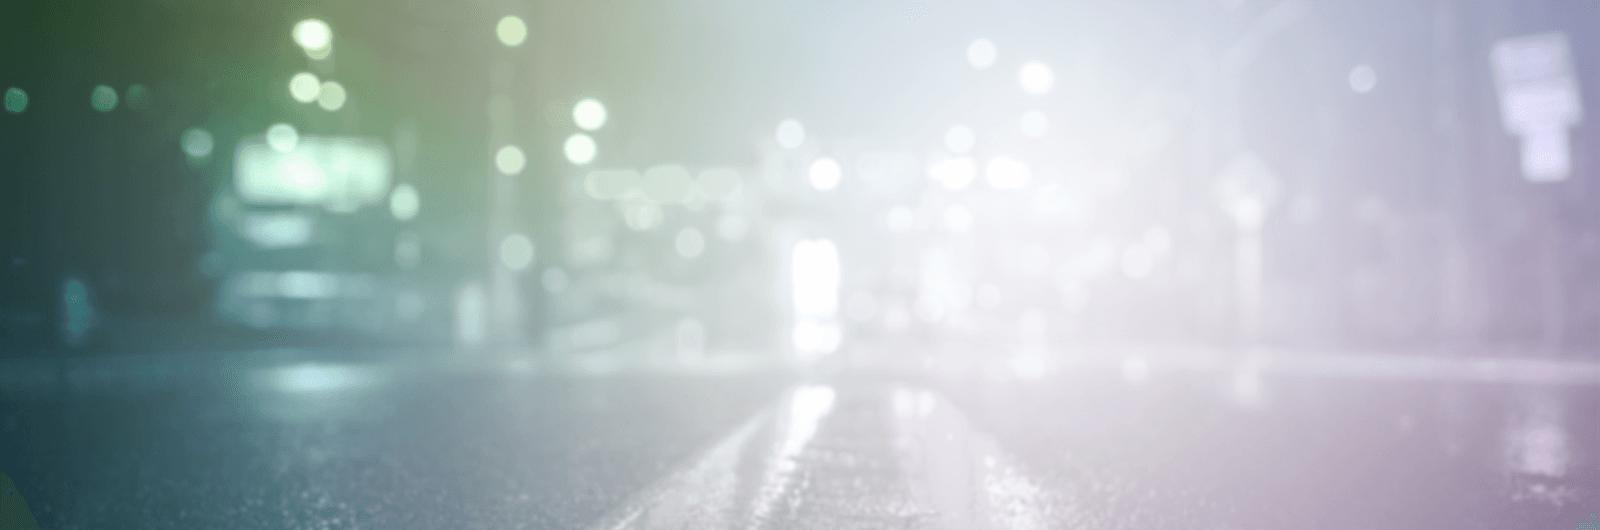 Grafenia-City-Lights-1600x530px